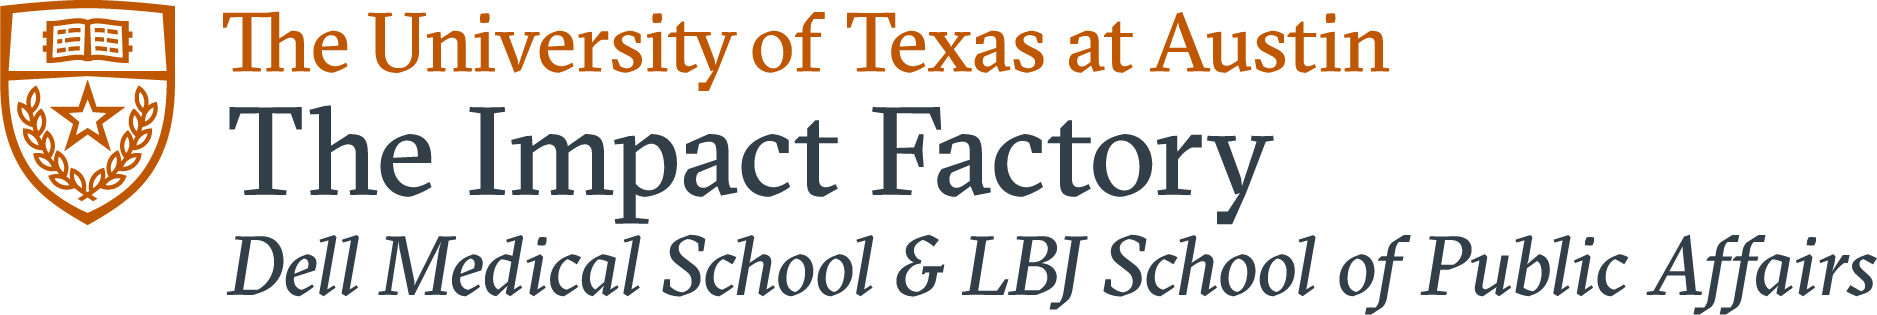 The Impact Factory logo